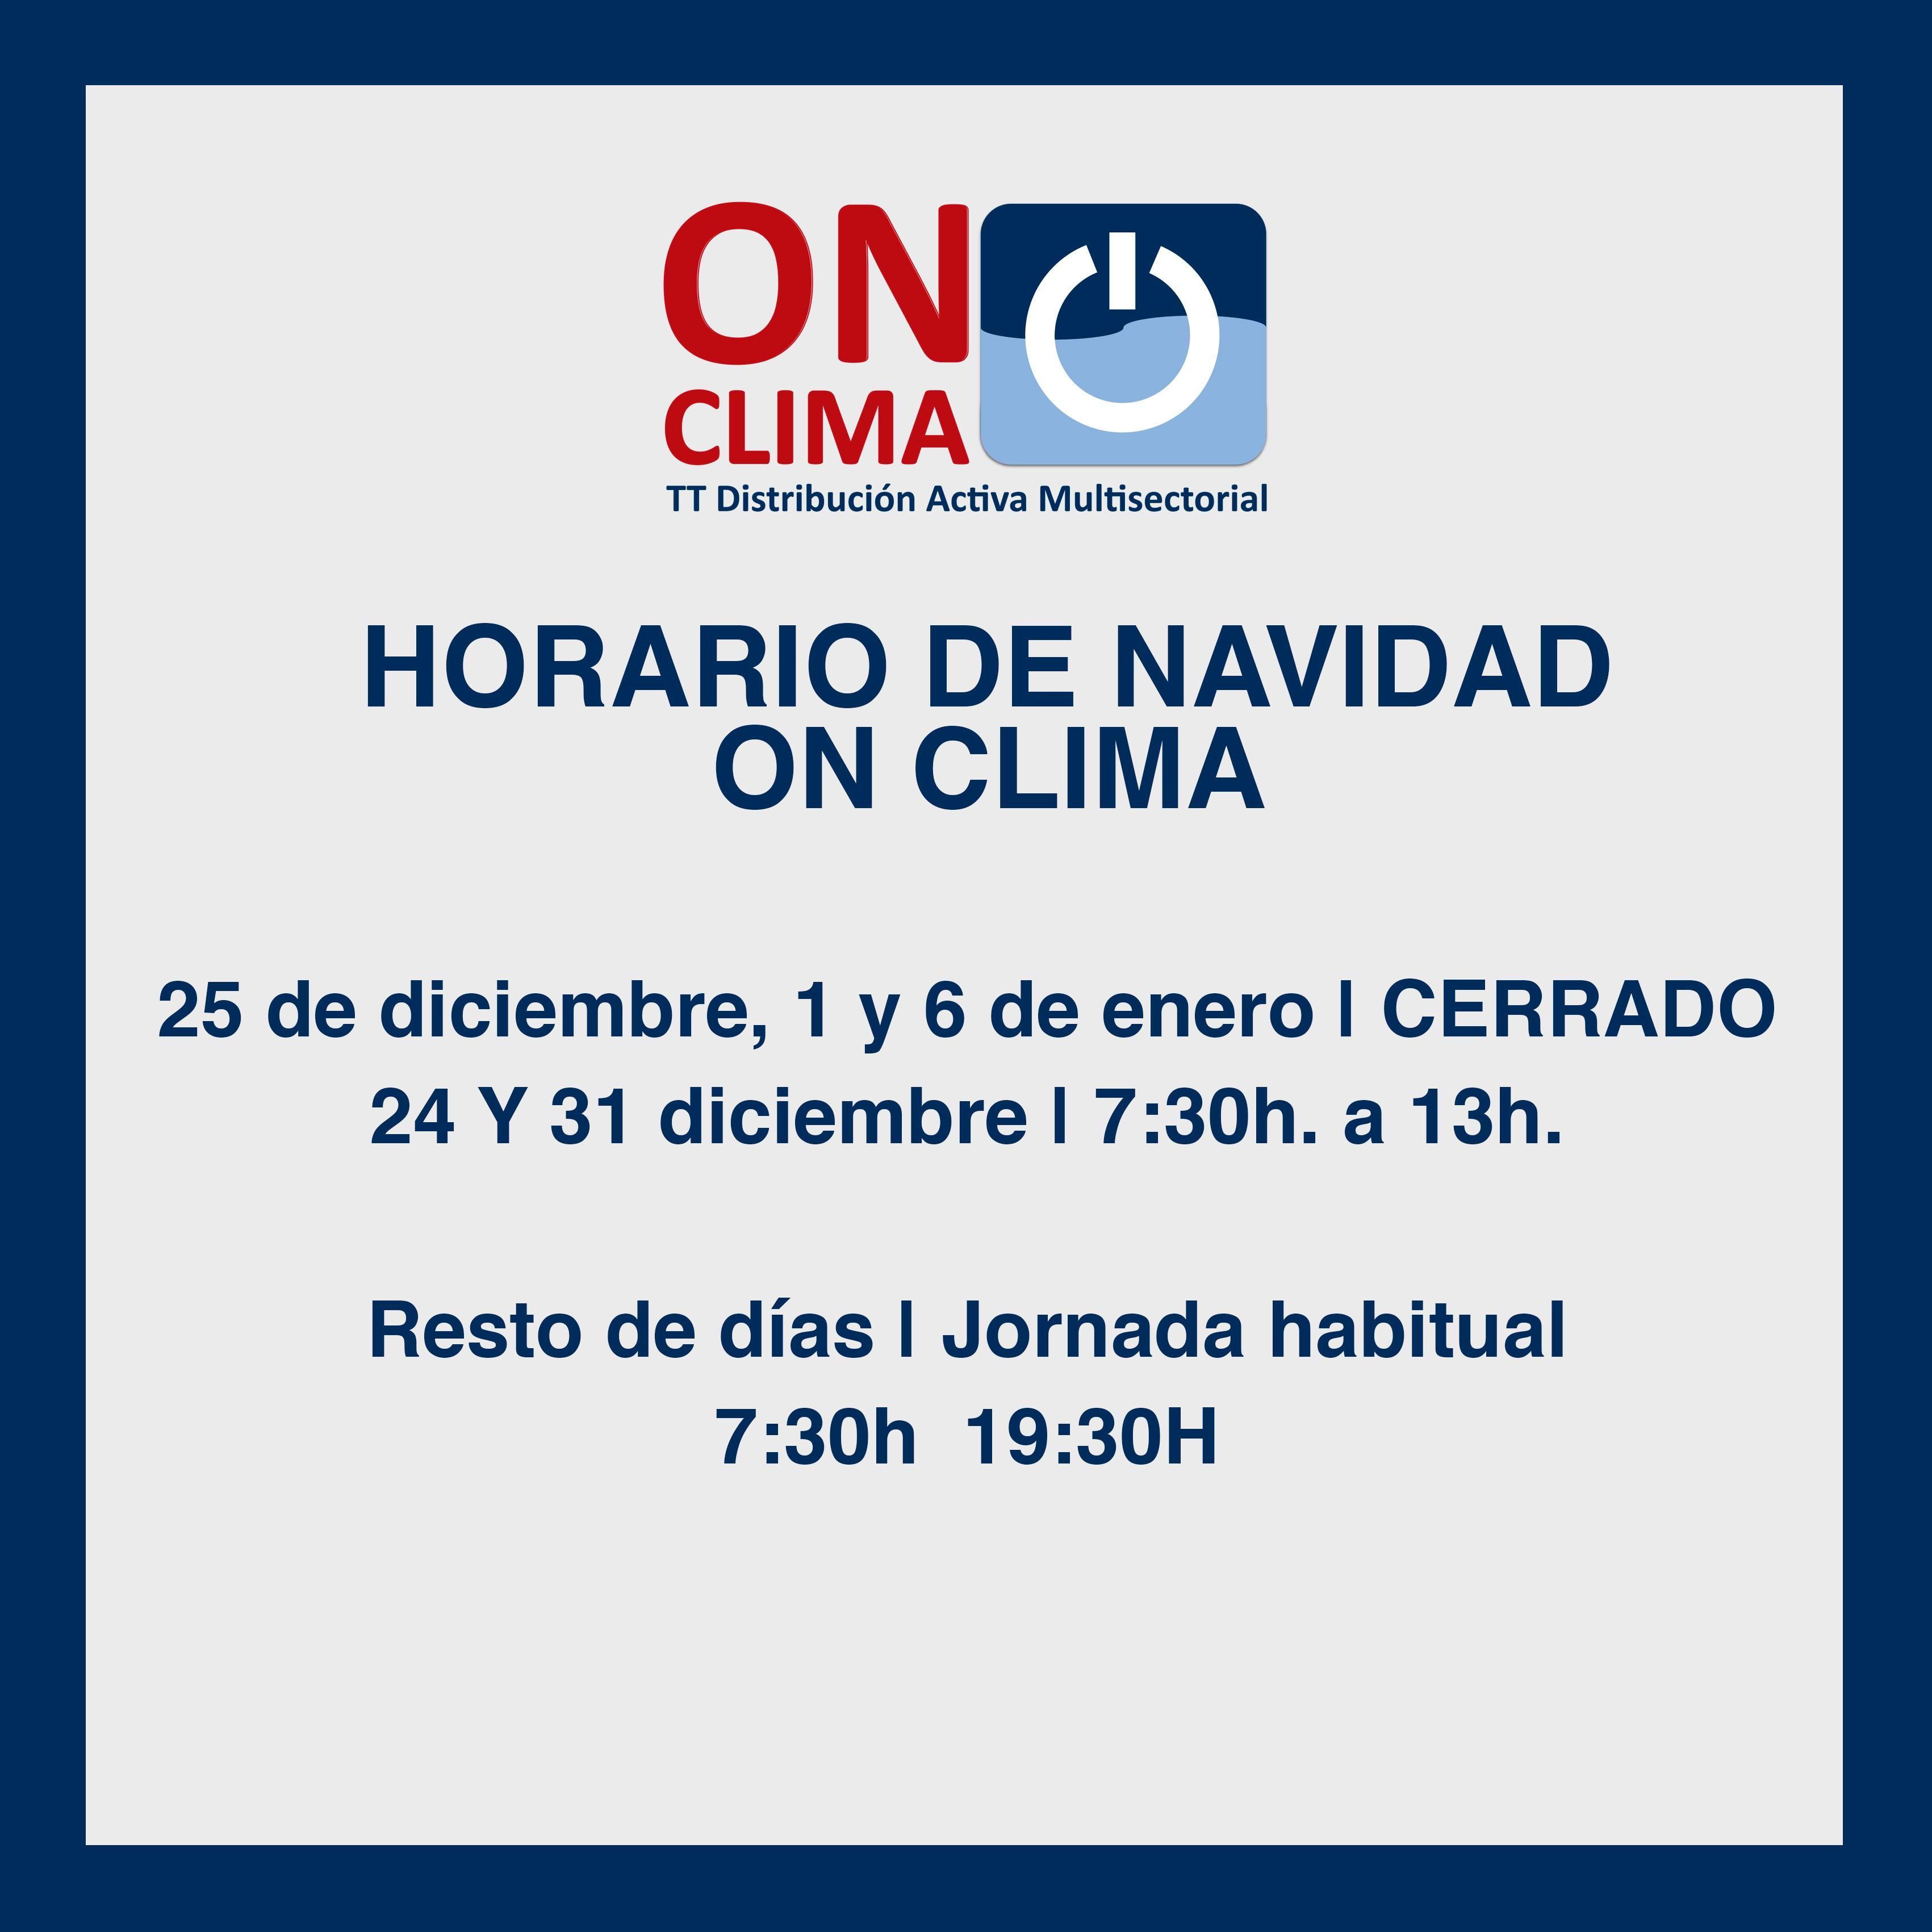 Horarios Navidad On Clima Onclima